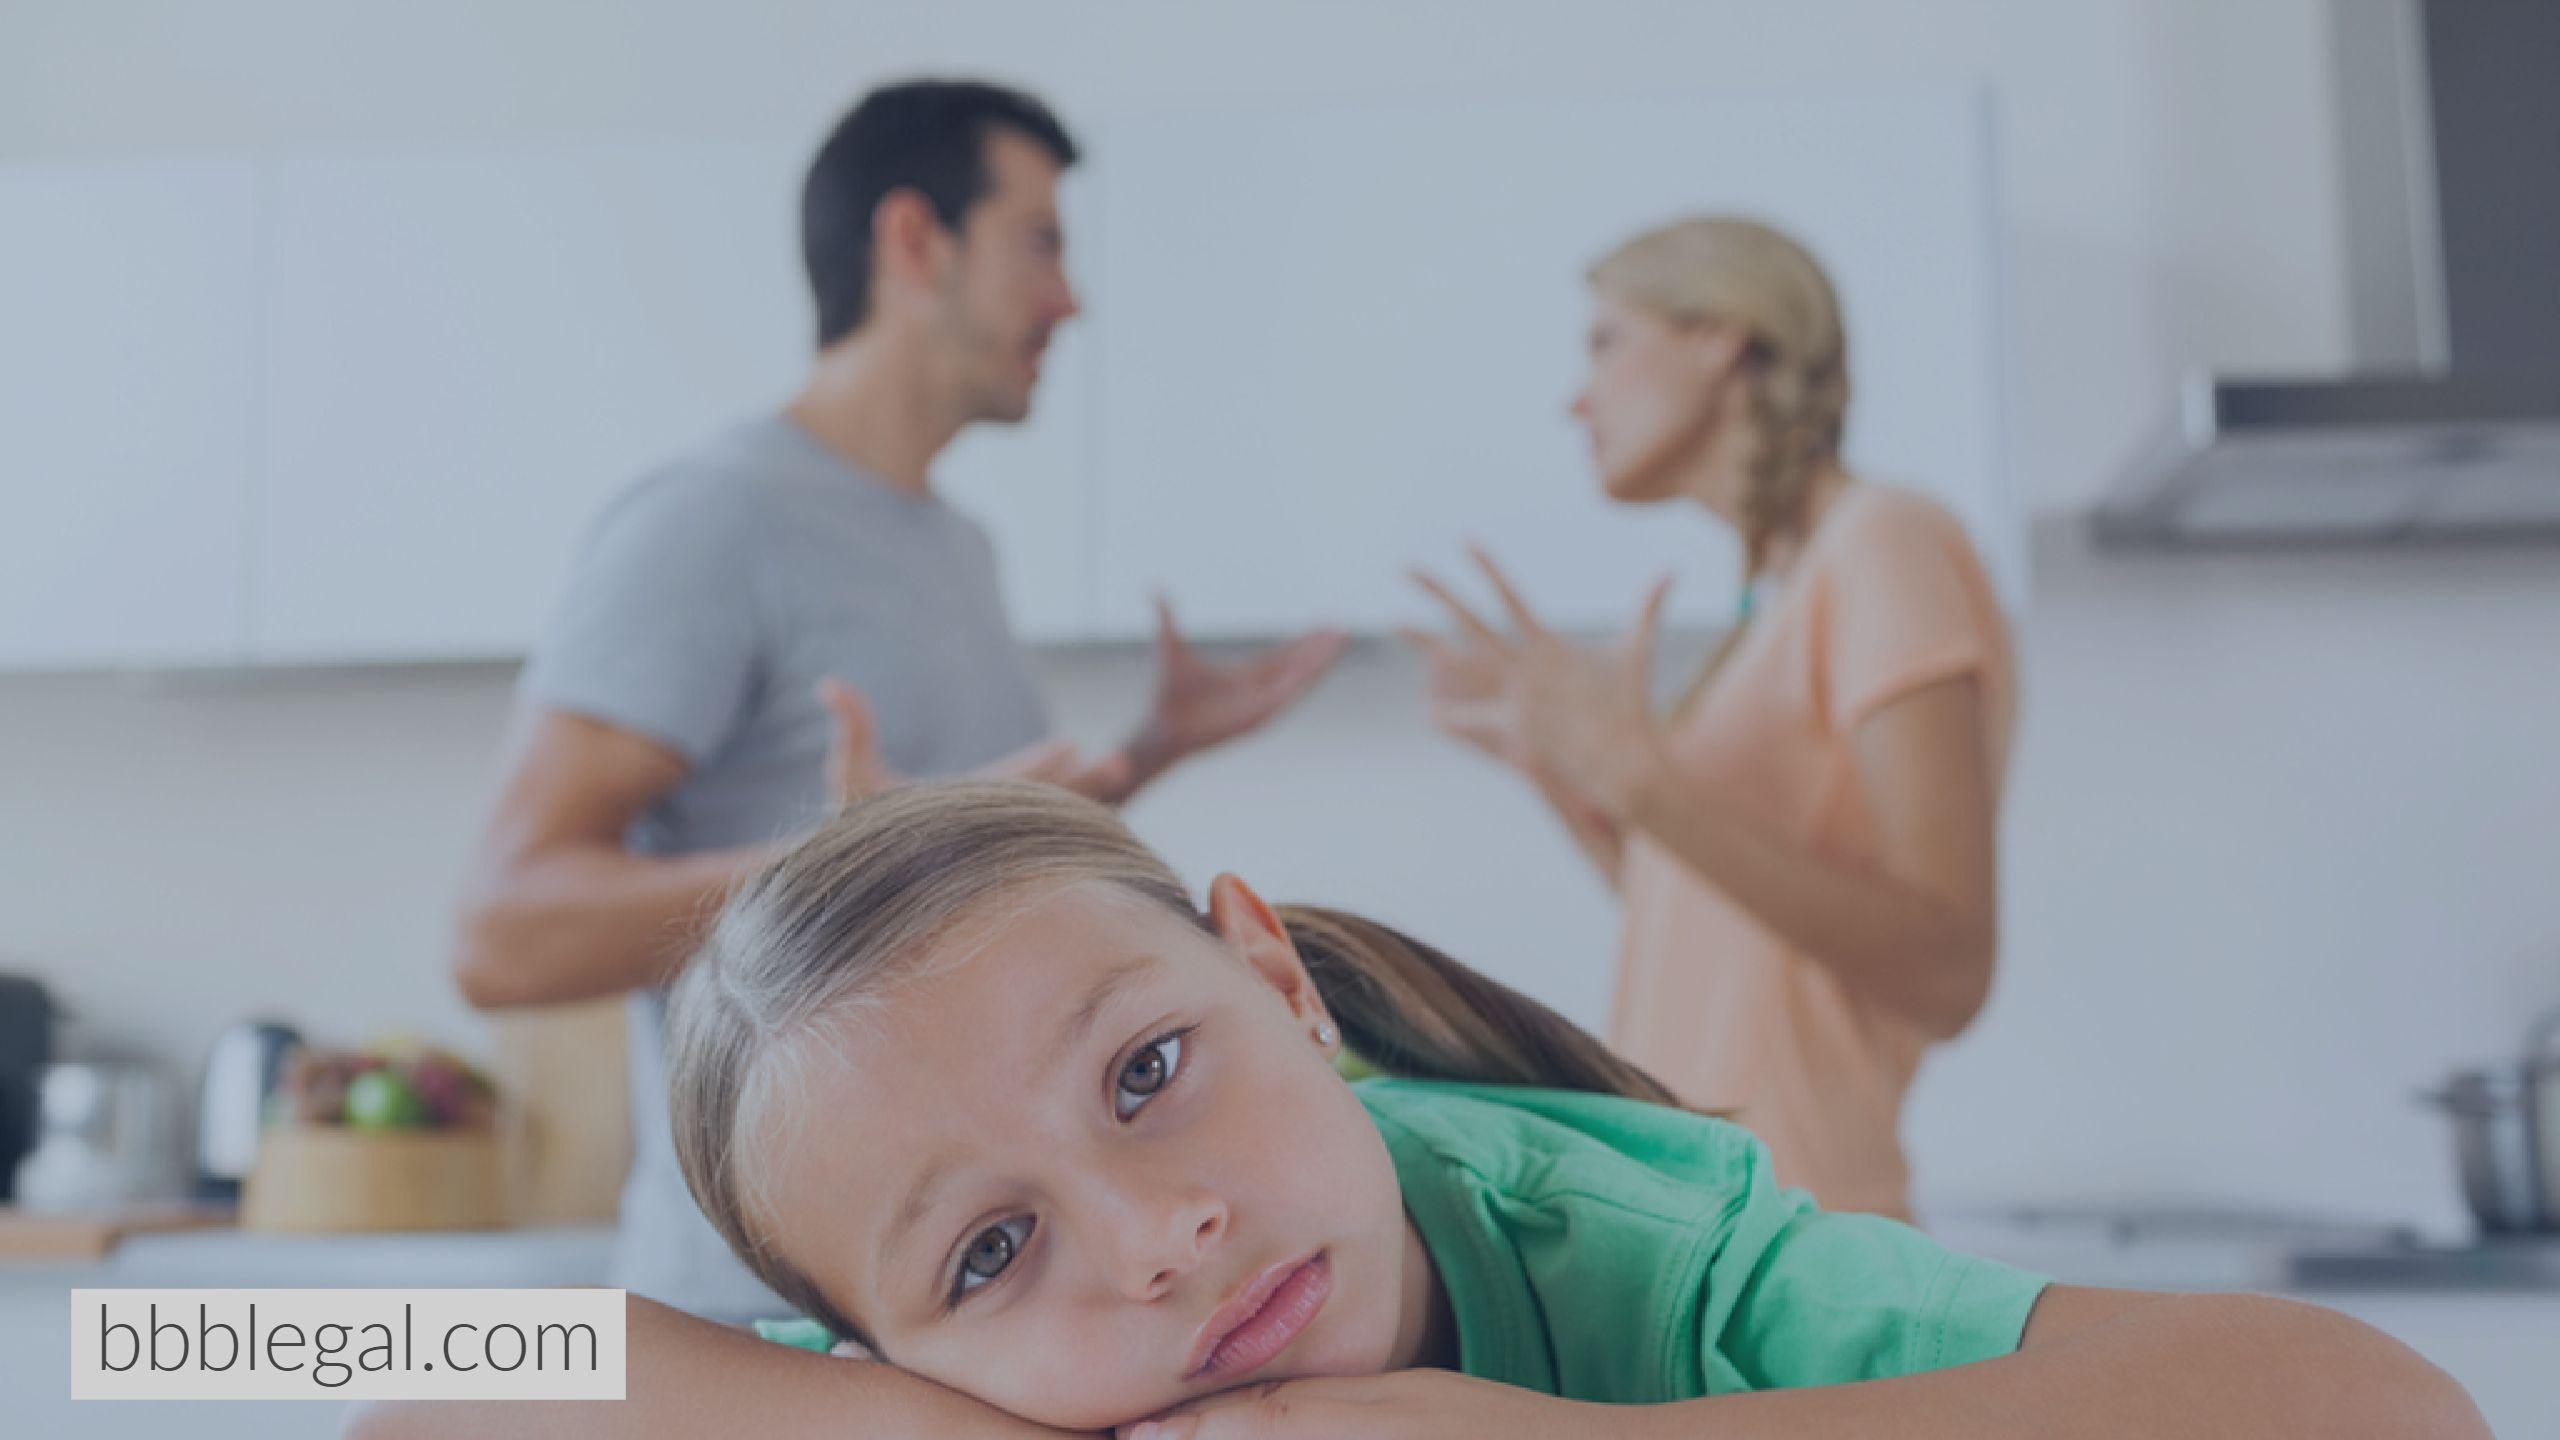 Child Custody Lawyer Divorce Attorney Child custody